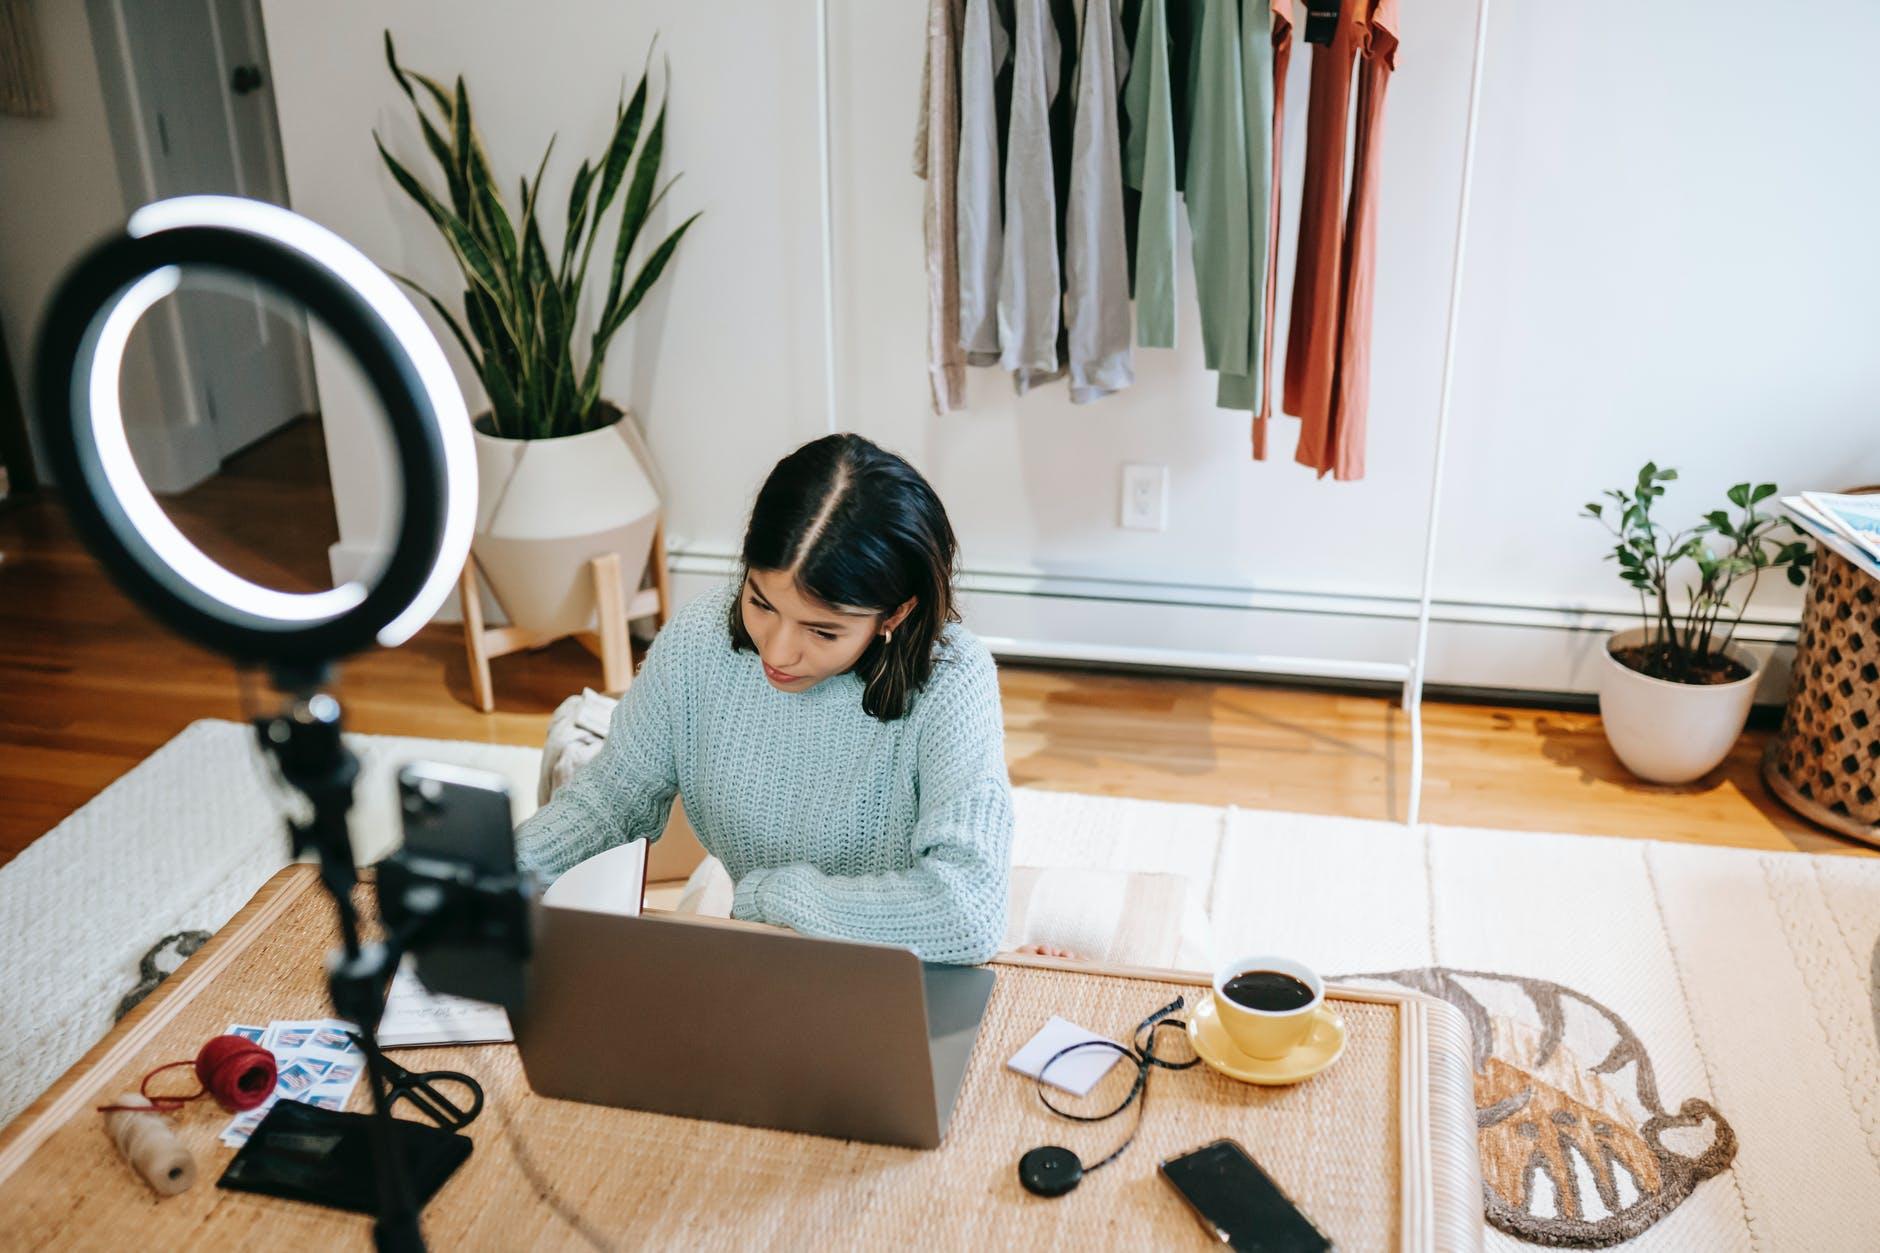 focused woman working at desk on laptop in studio